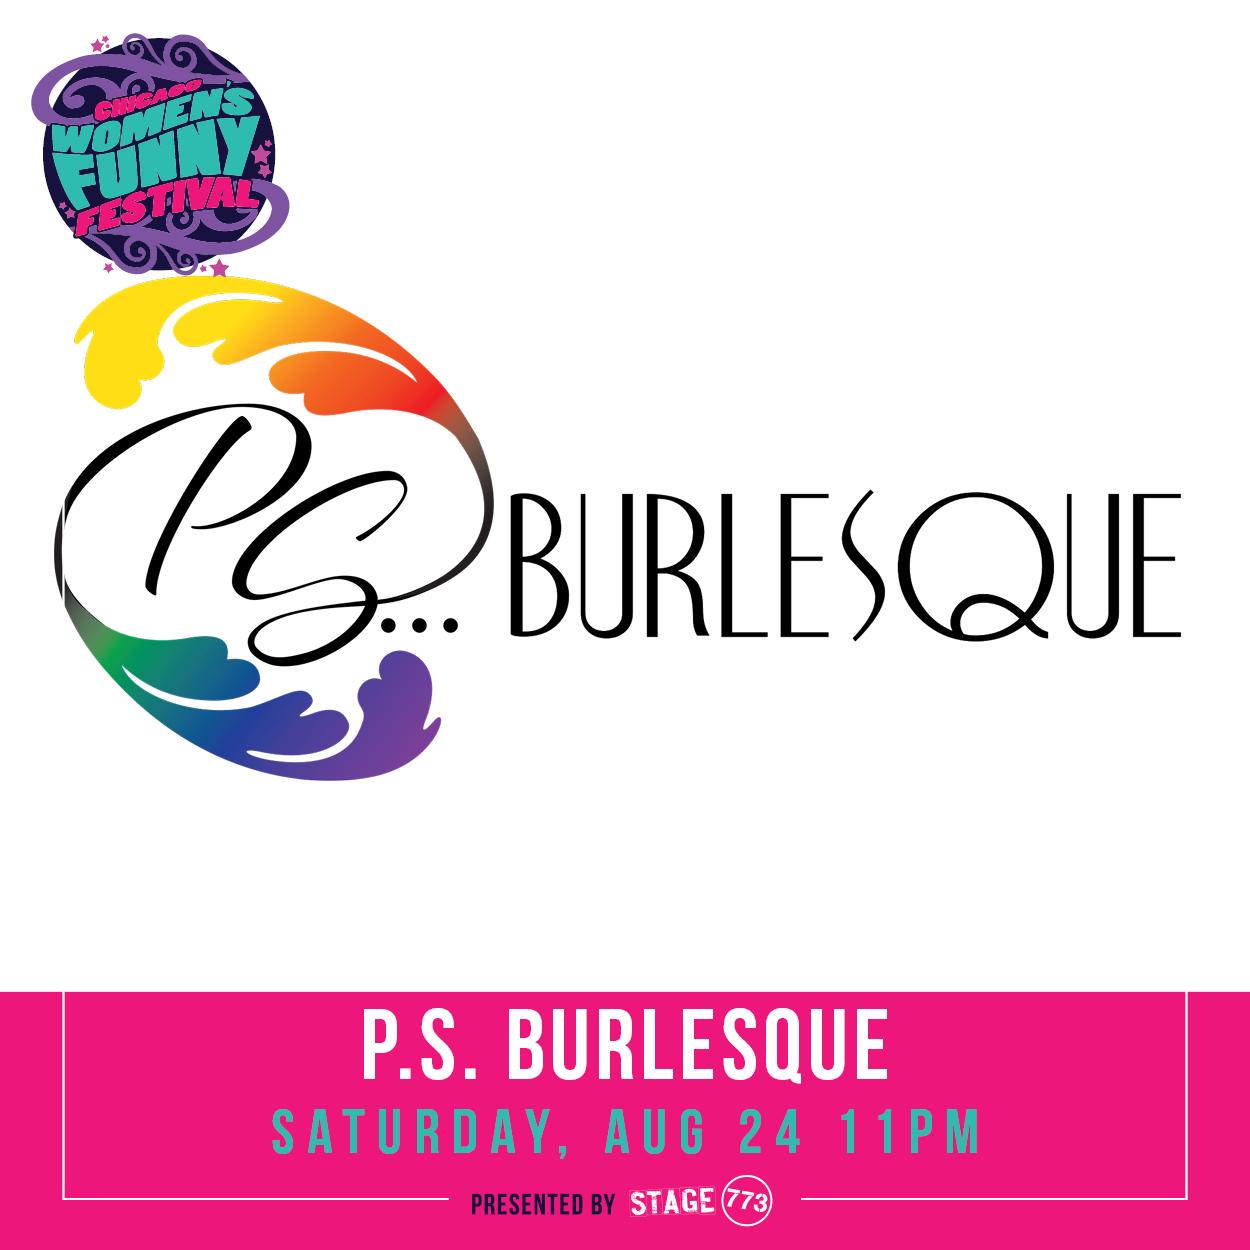 PSBurlesque_Saturday_11PM_CWFF20194.jpg